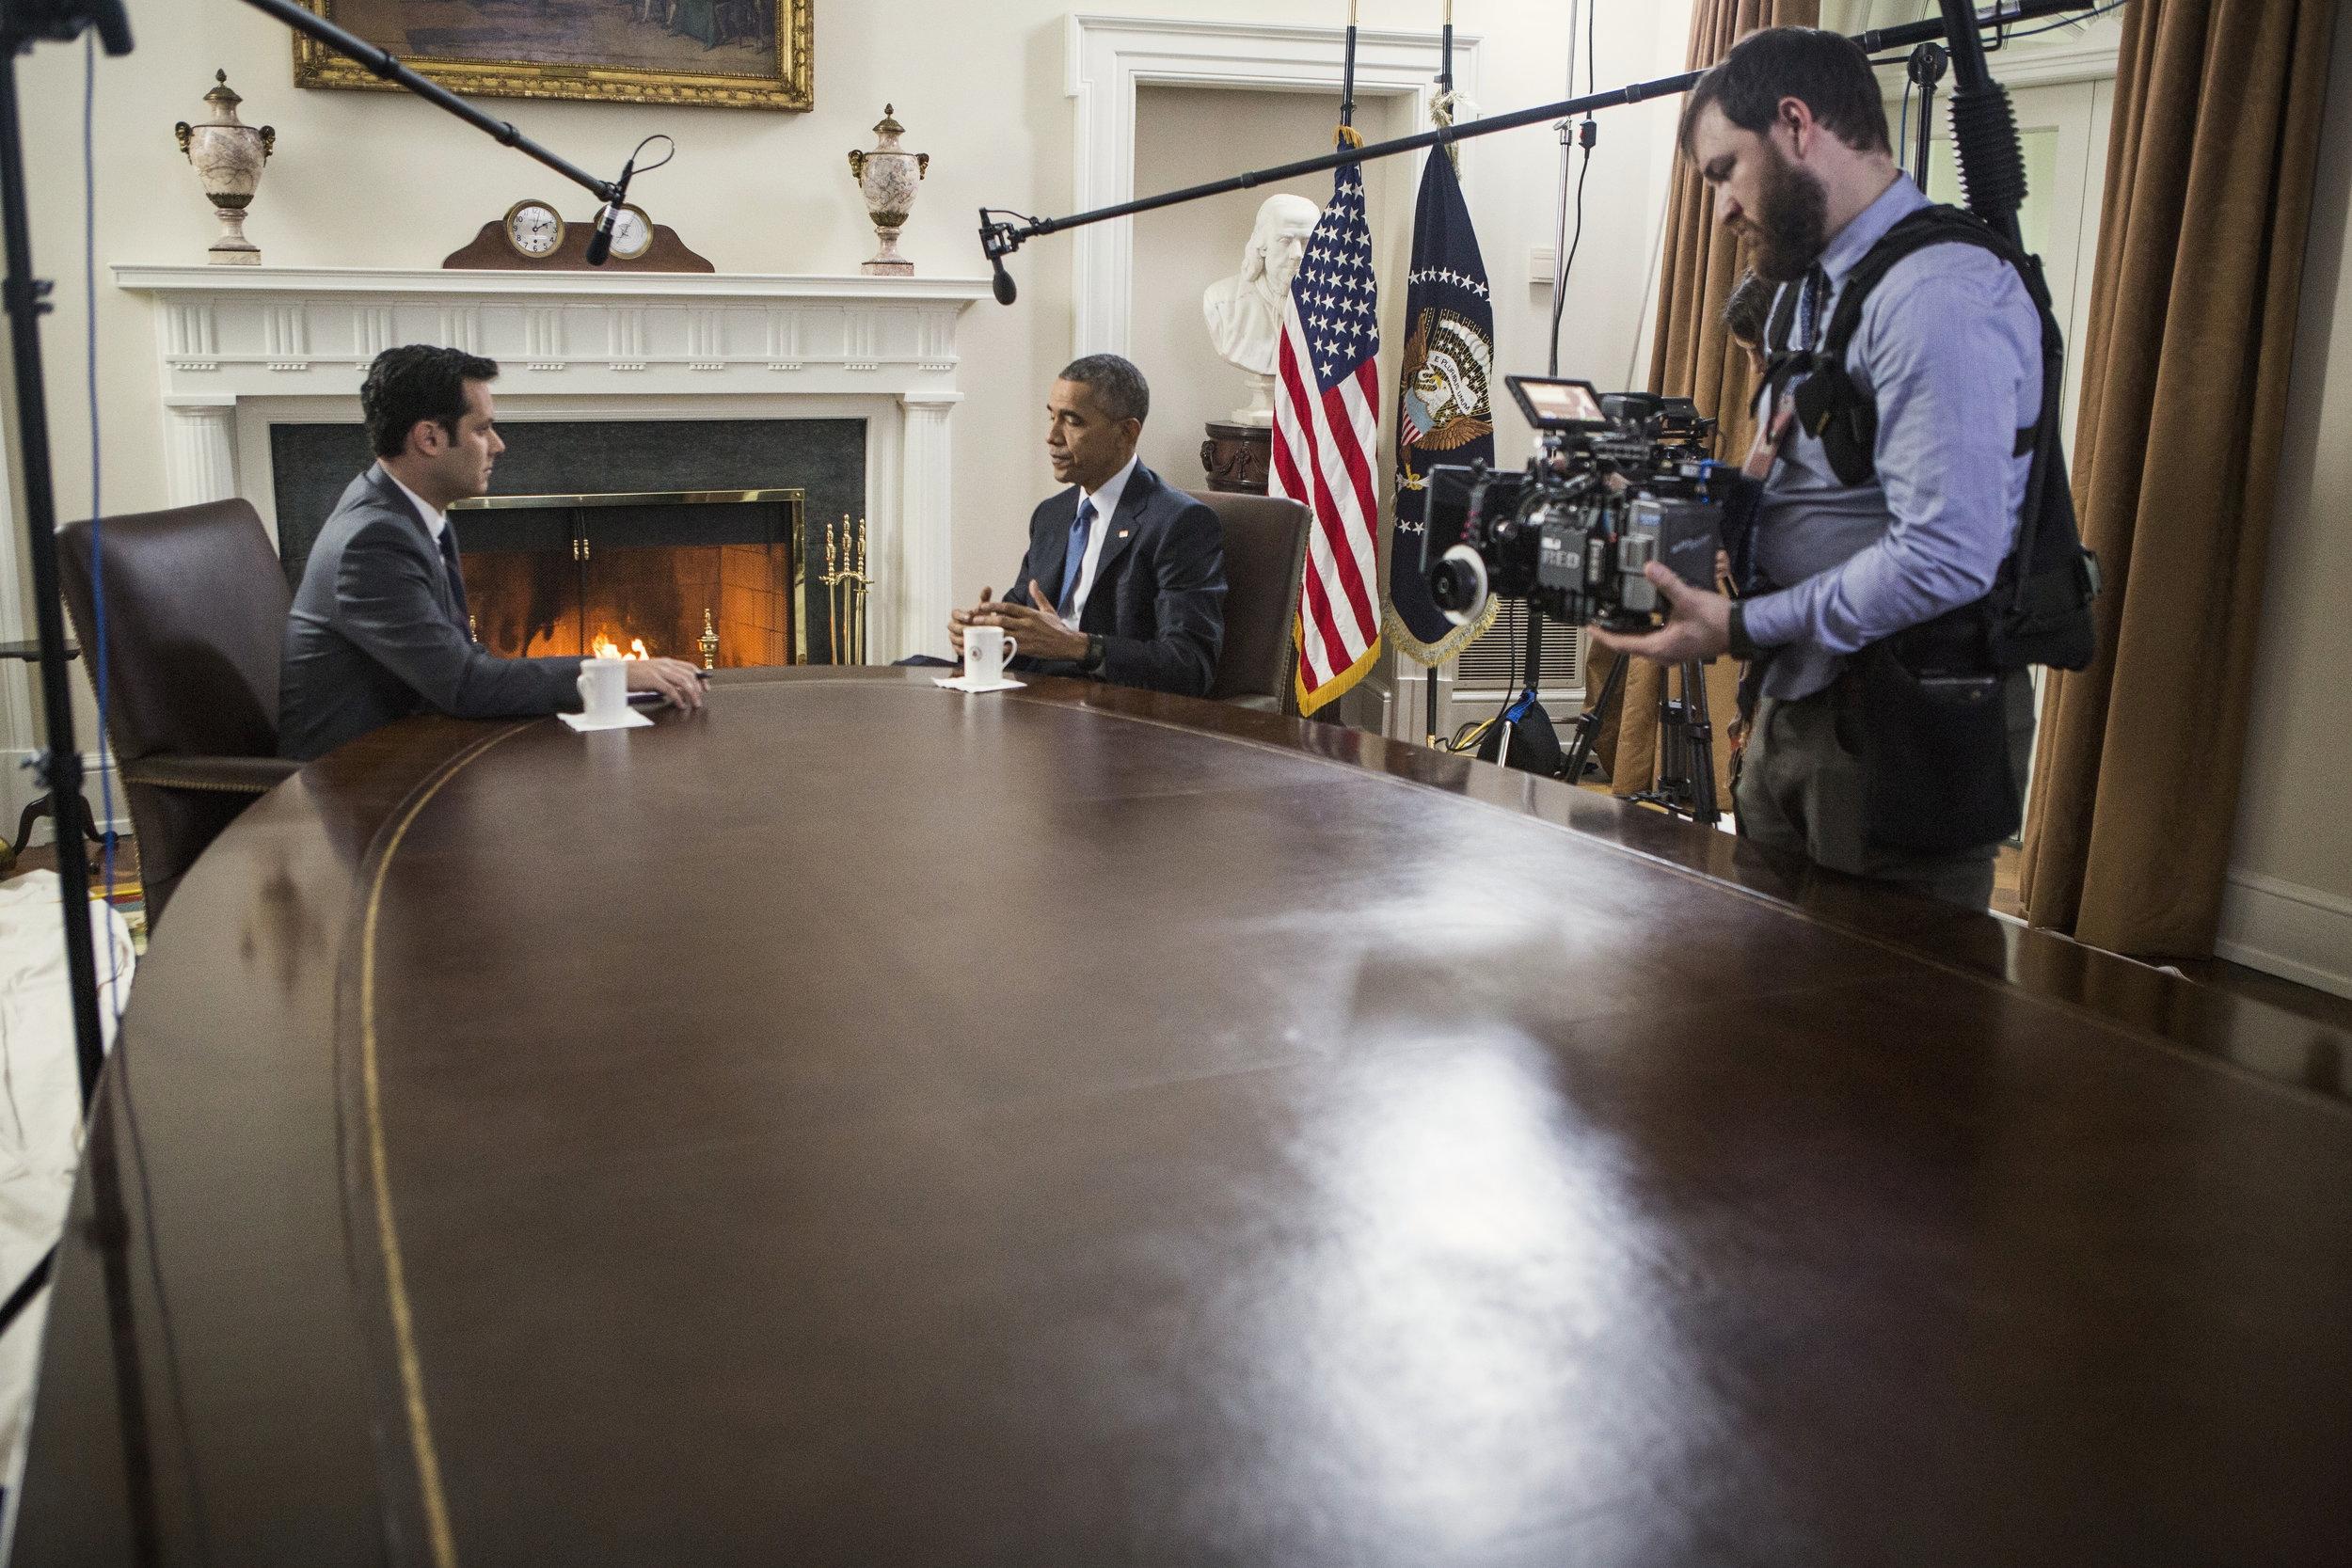 president-obama-010-03202015.jpg